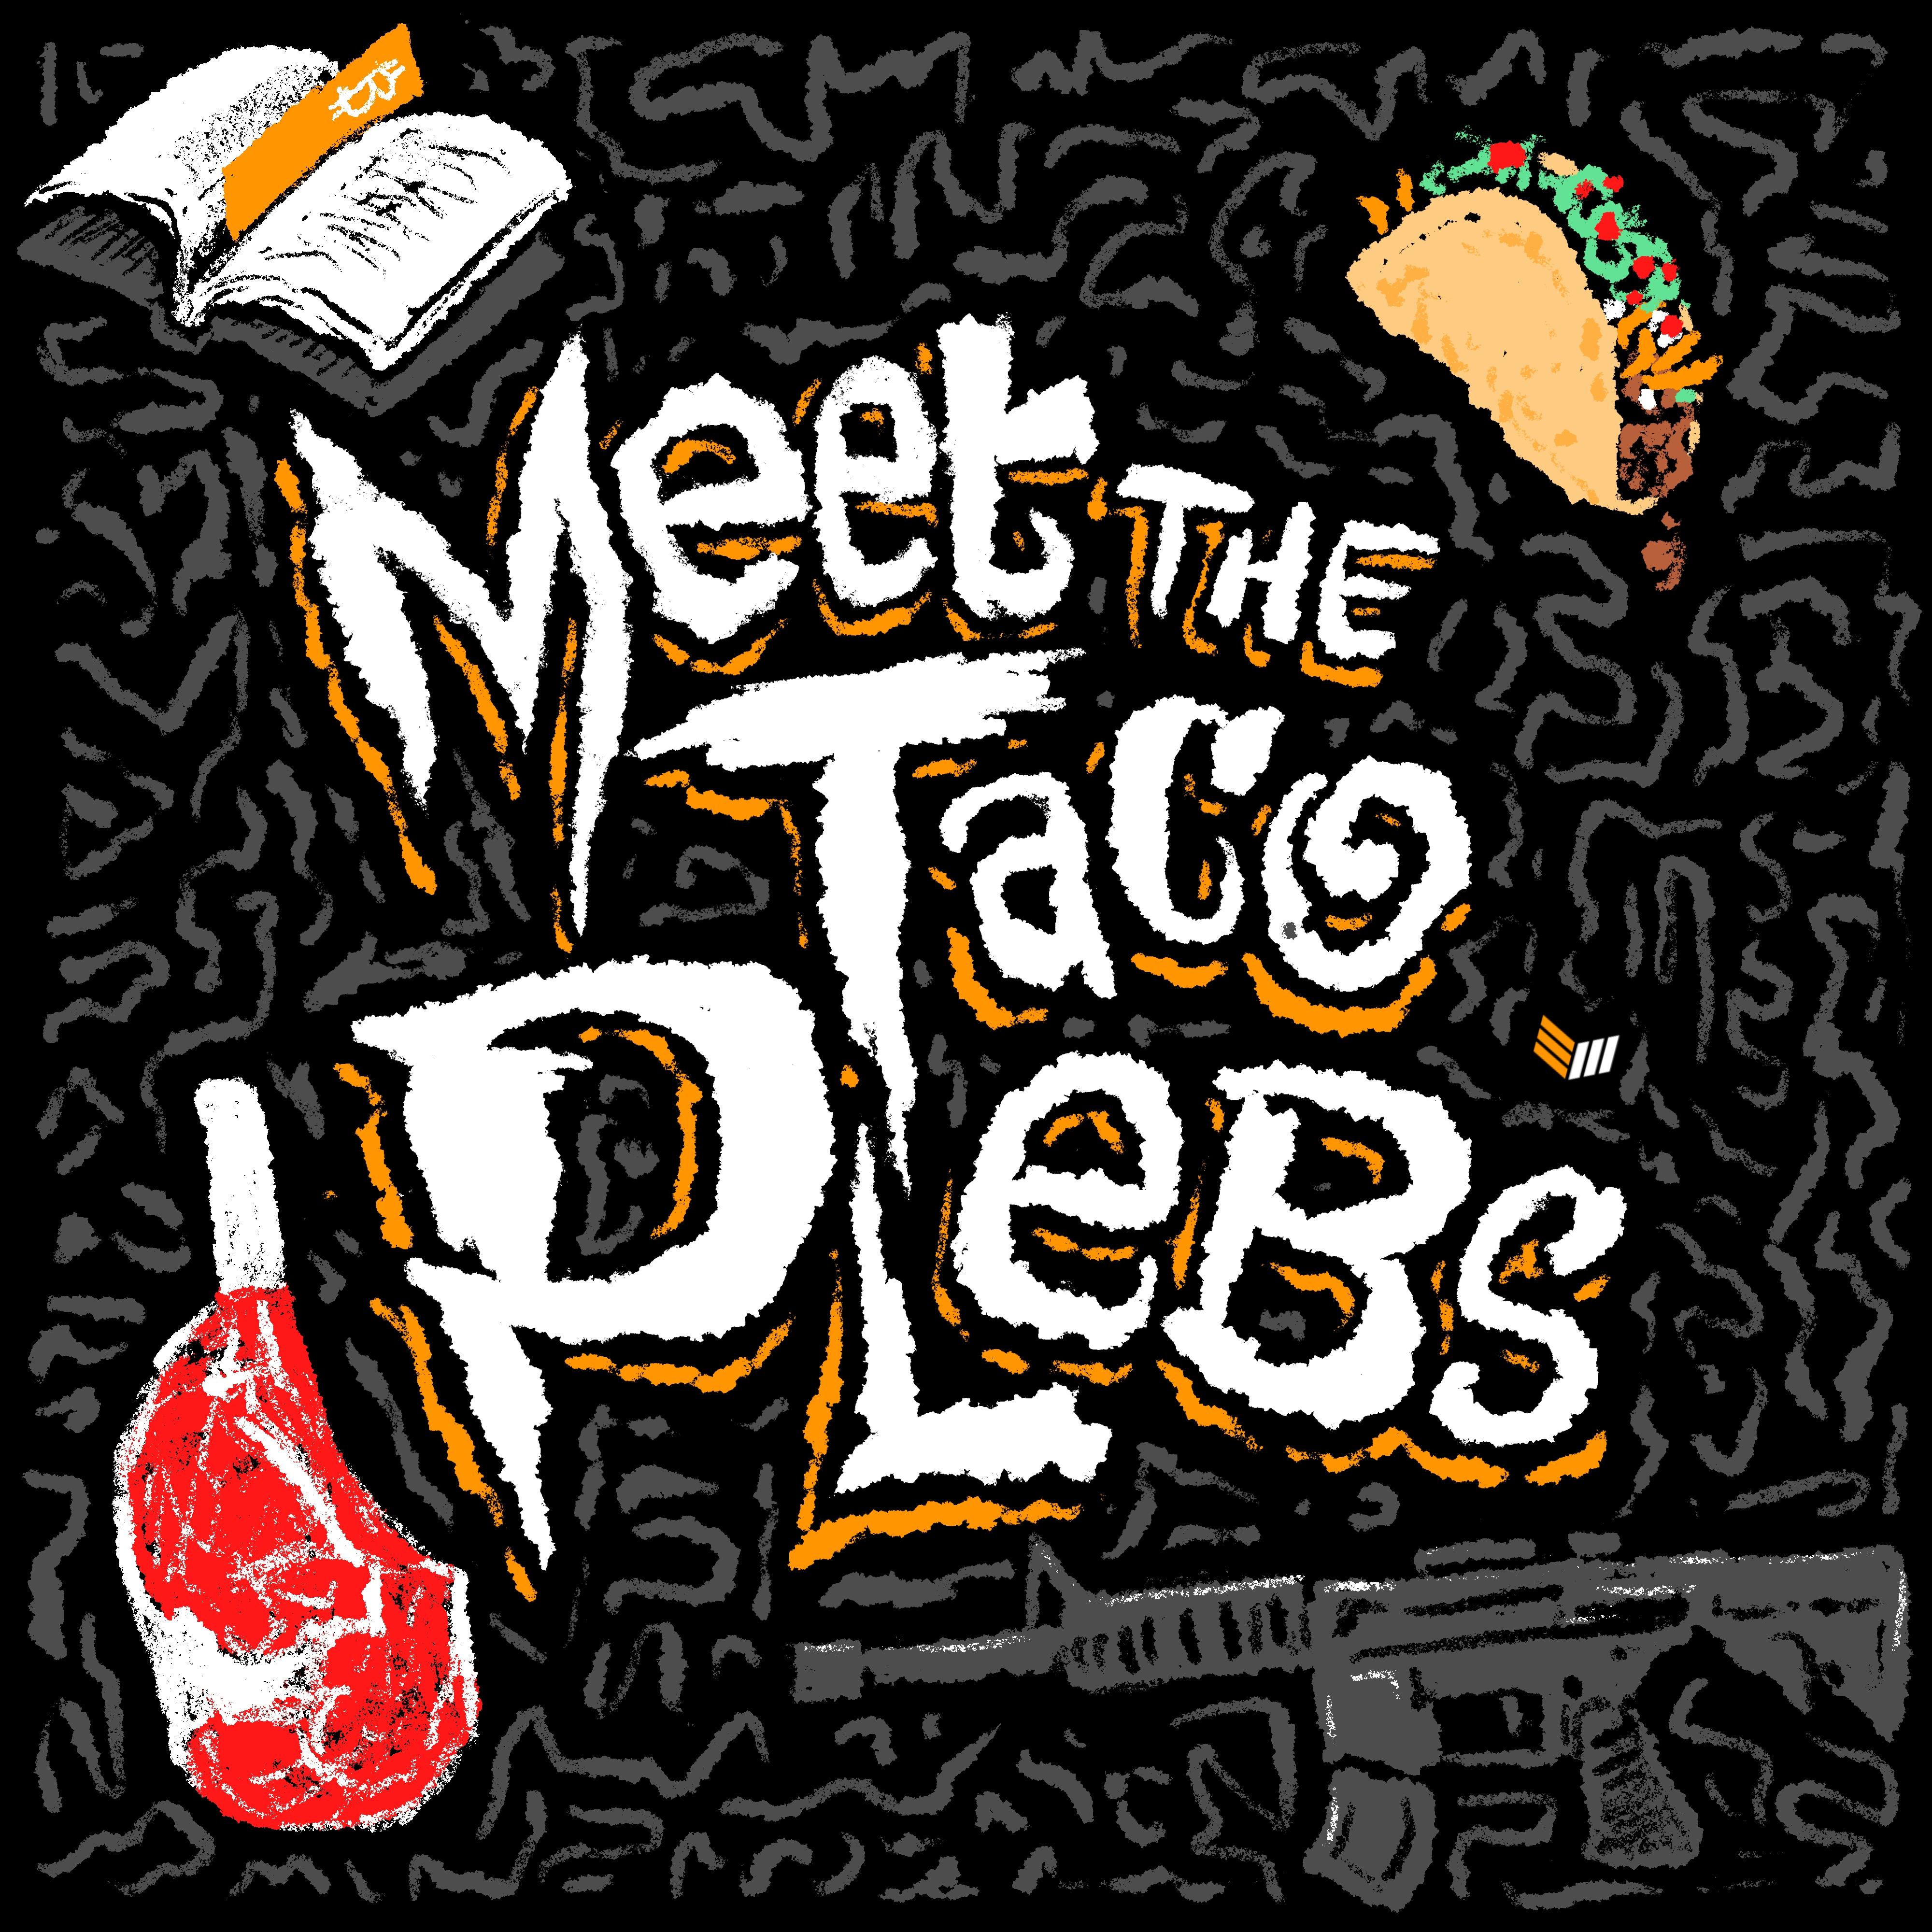 Meet the Taco Plebs podcast cover art